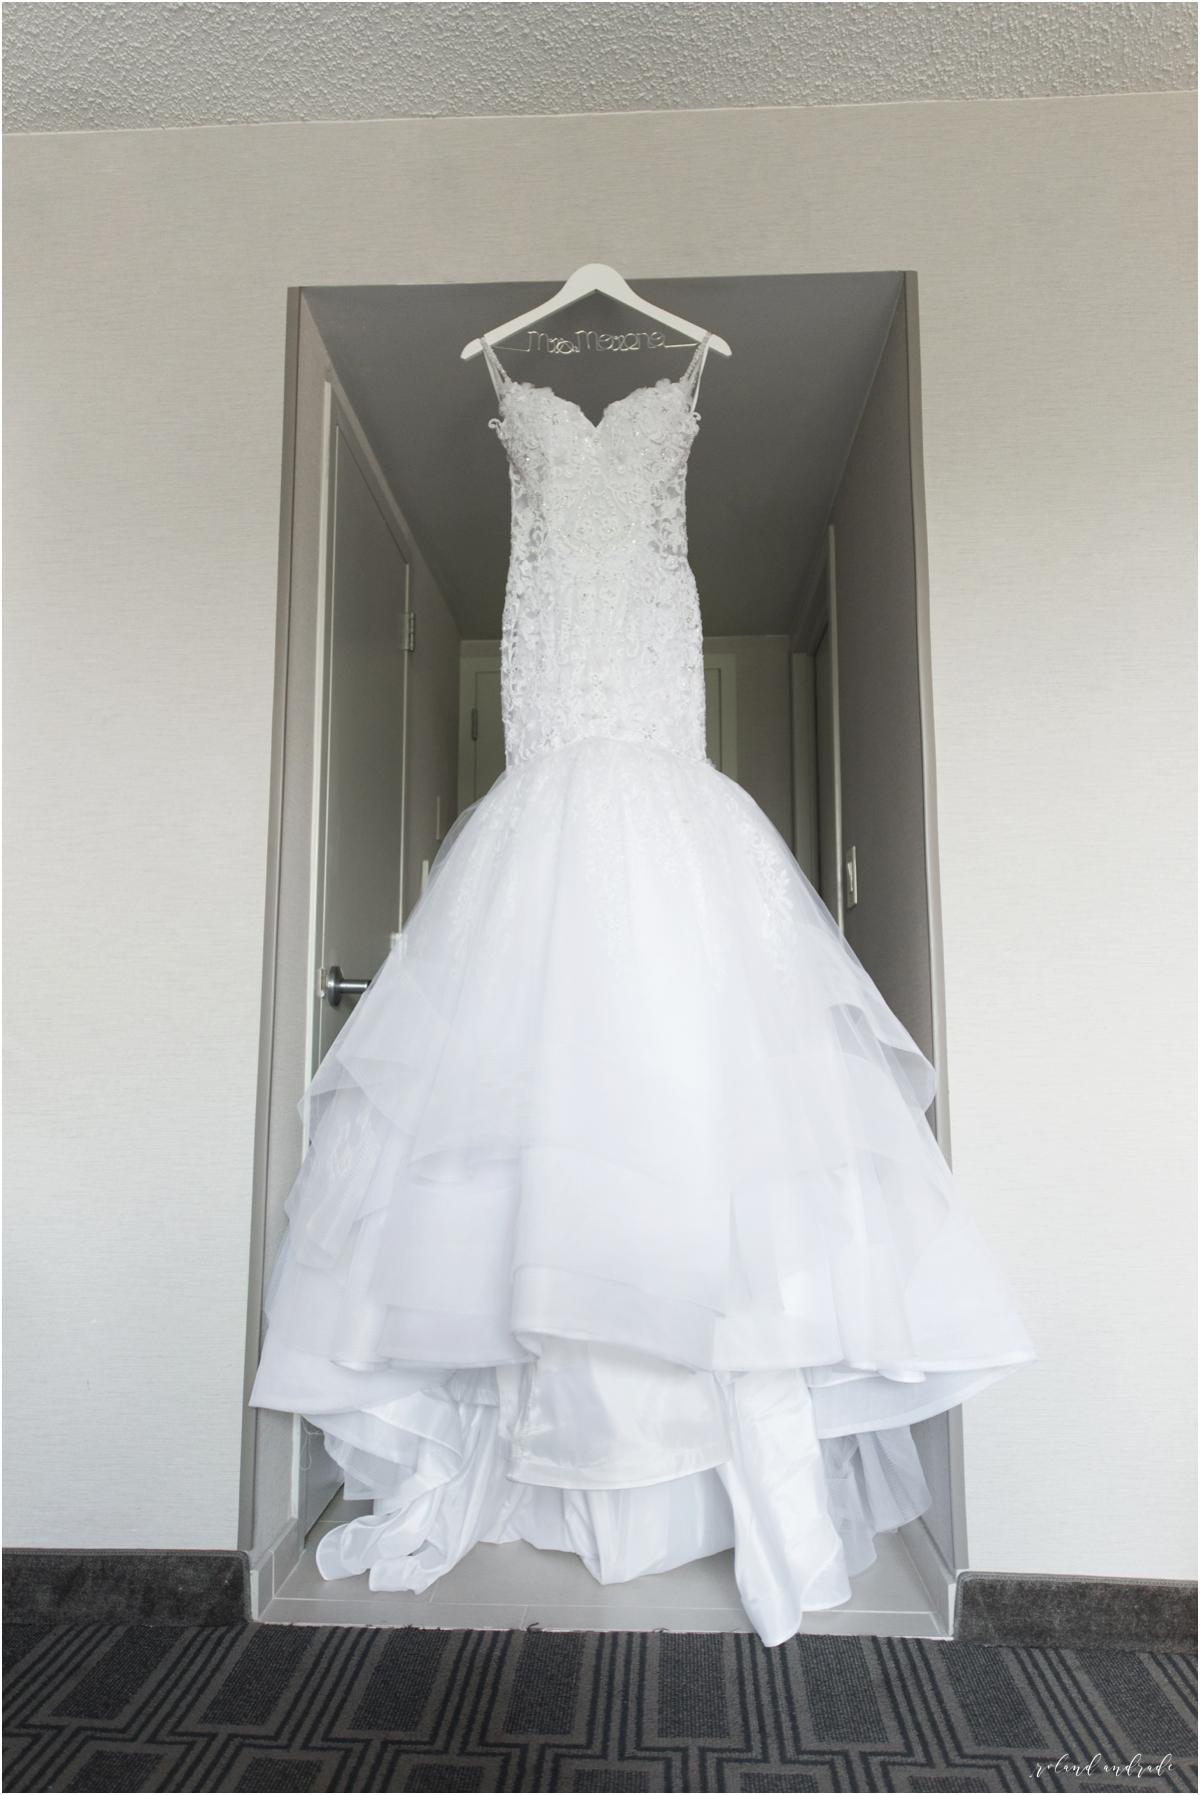 Danada House Wedding Photography Wheaton Illinois - Chicago Wedding Photography_0014.jpg